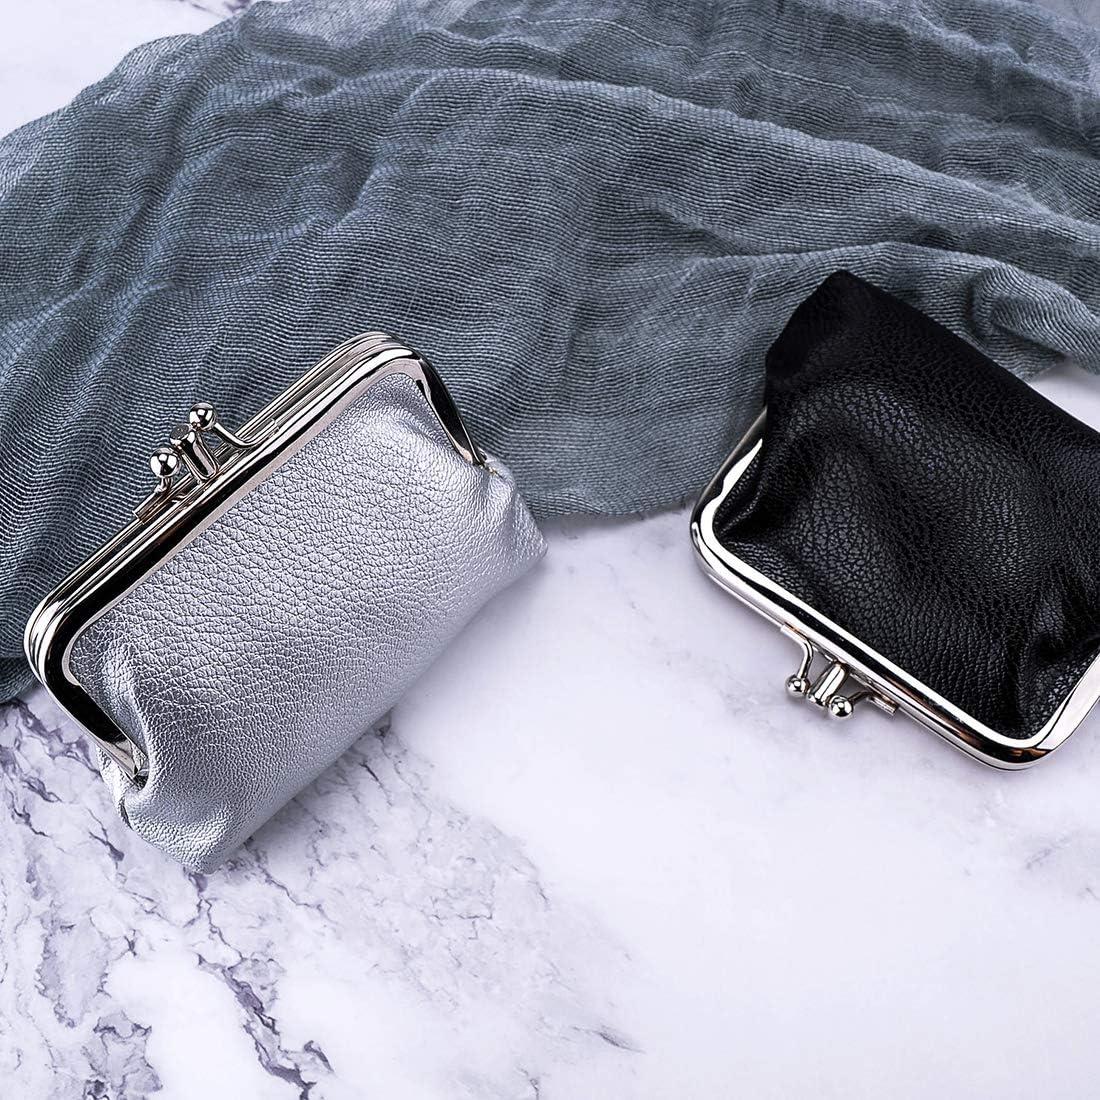 Macaron Coin Purse Change purse Money pouch Earplug purse